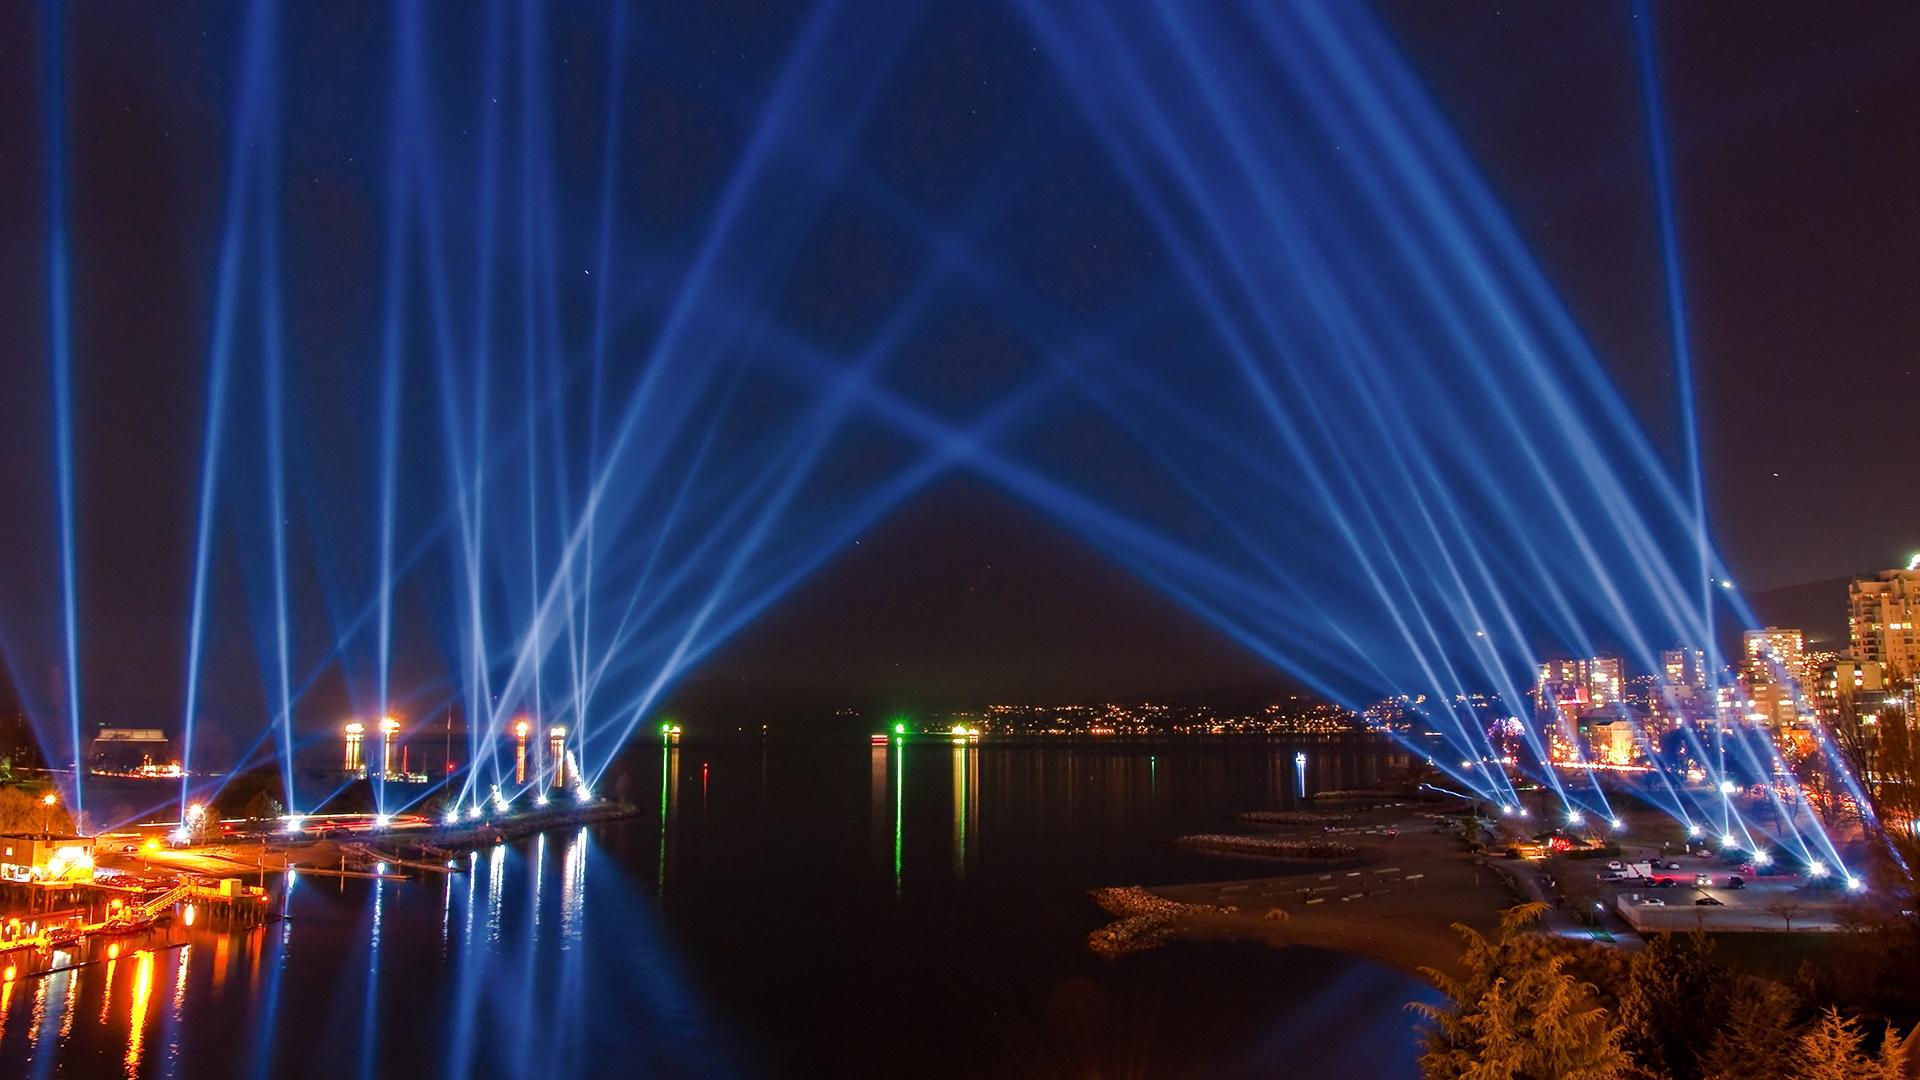 Download Wallpaper 1920x1080 City Lights, Sky, Light